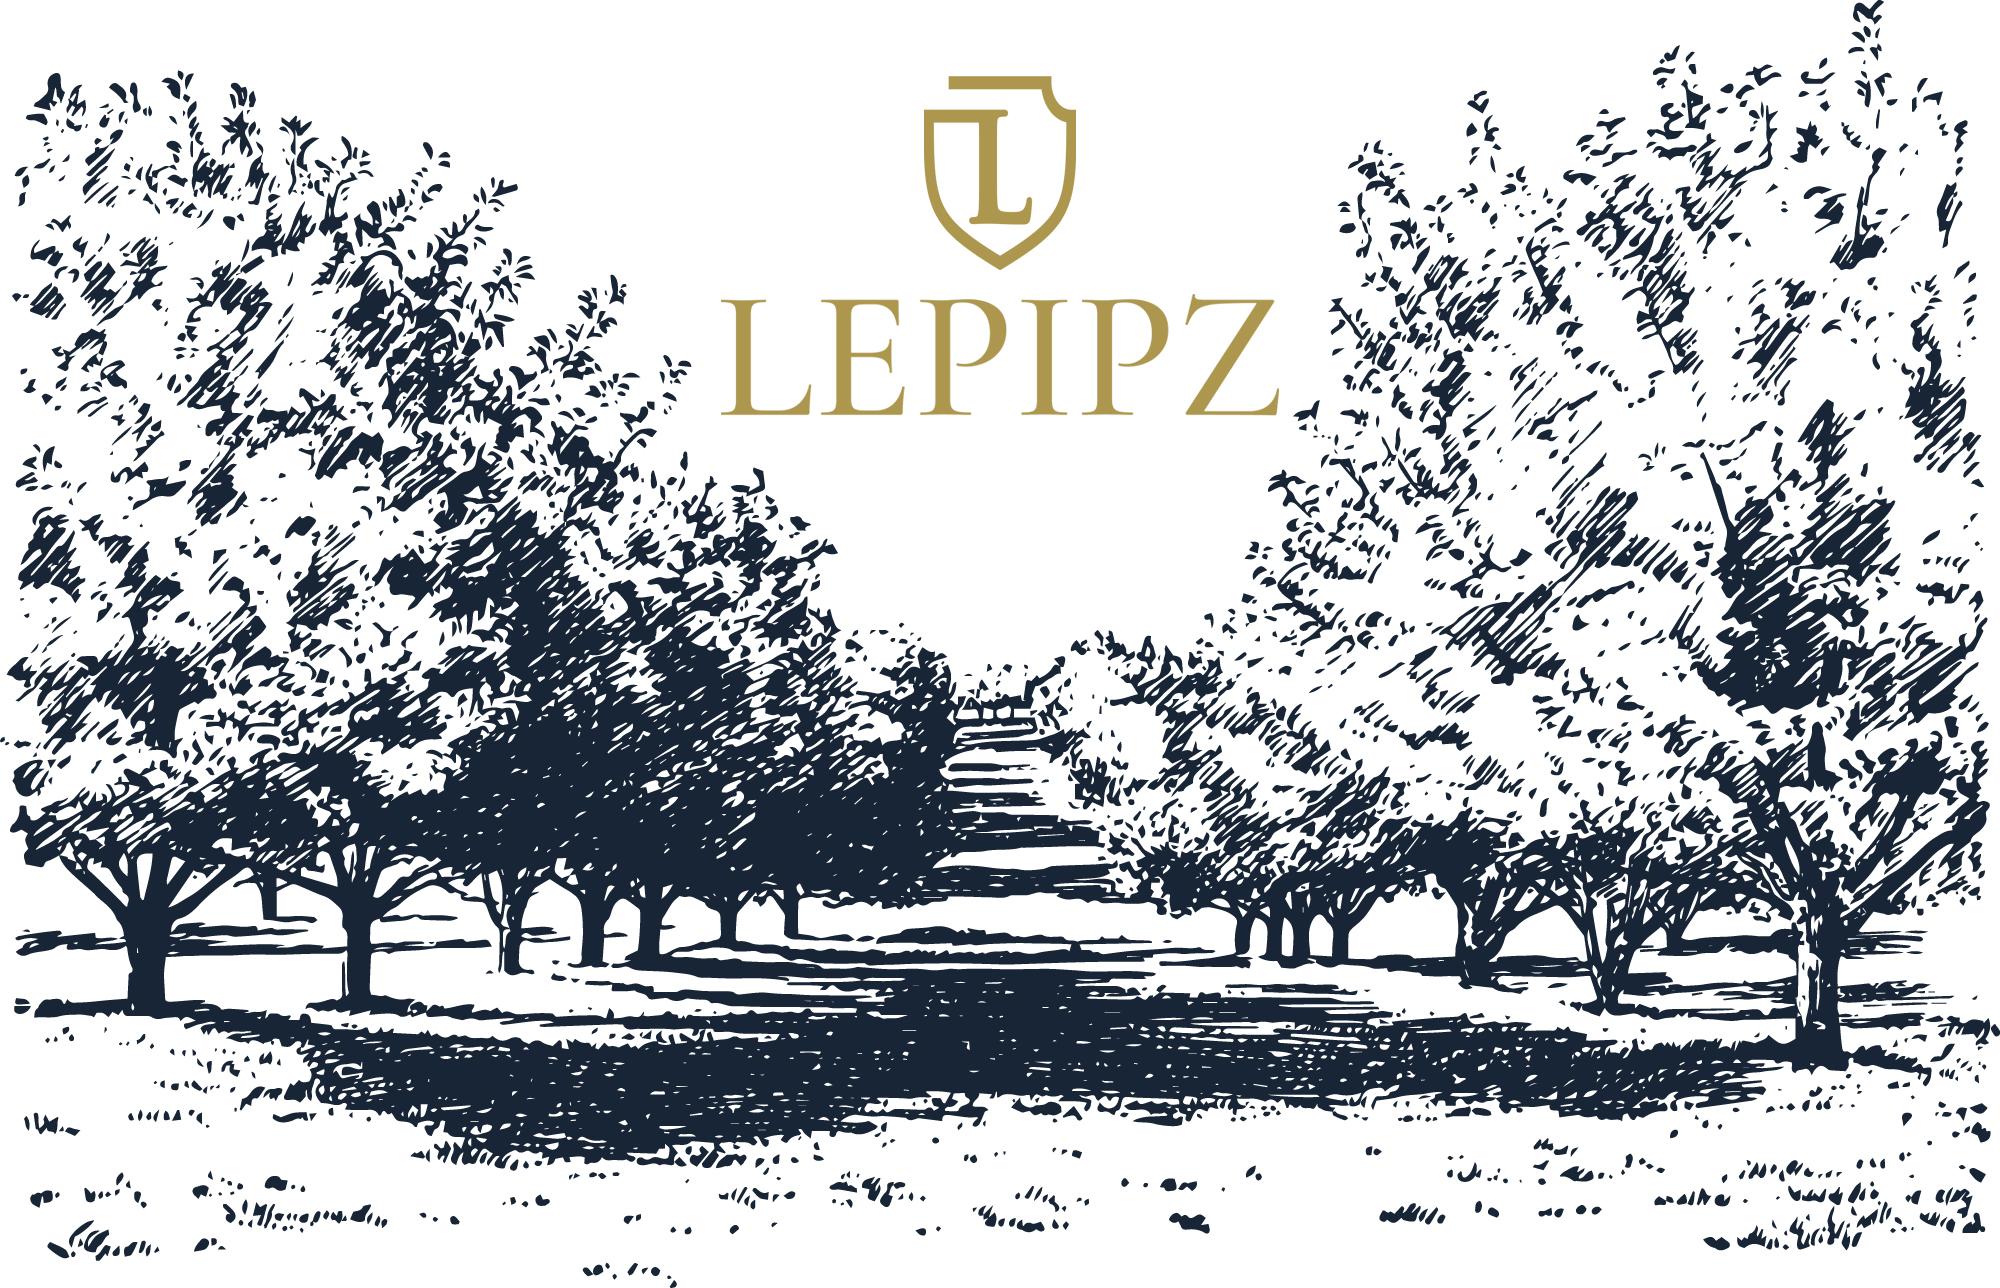 LePipz